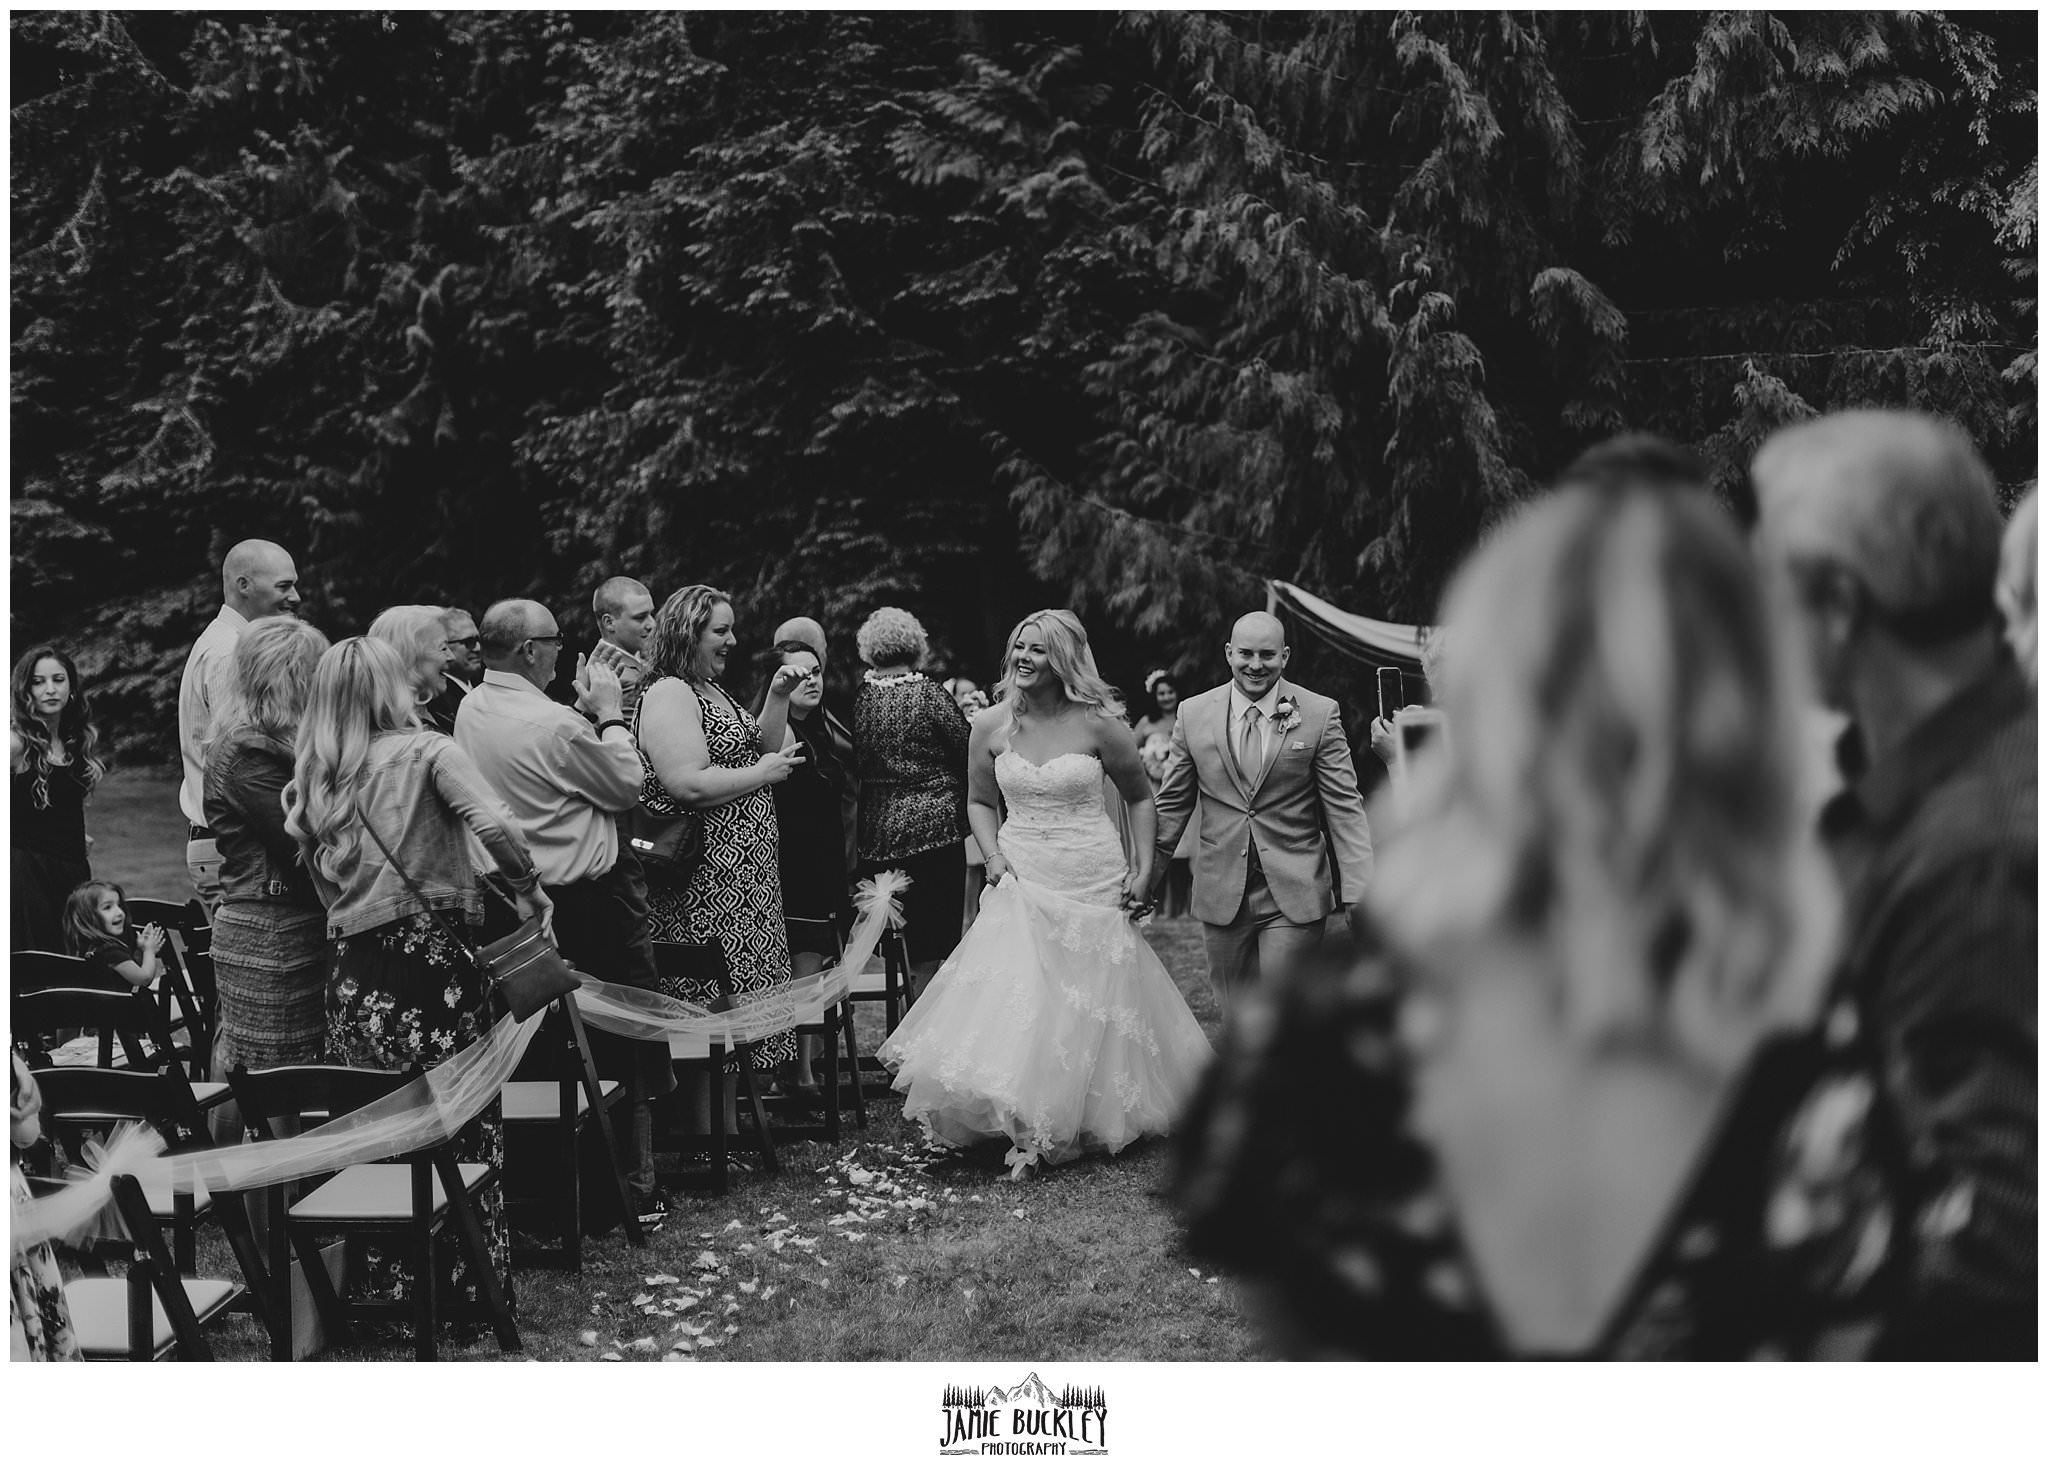 wedding ceremony exit of bride and groom